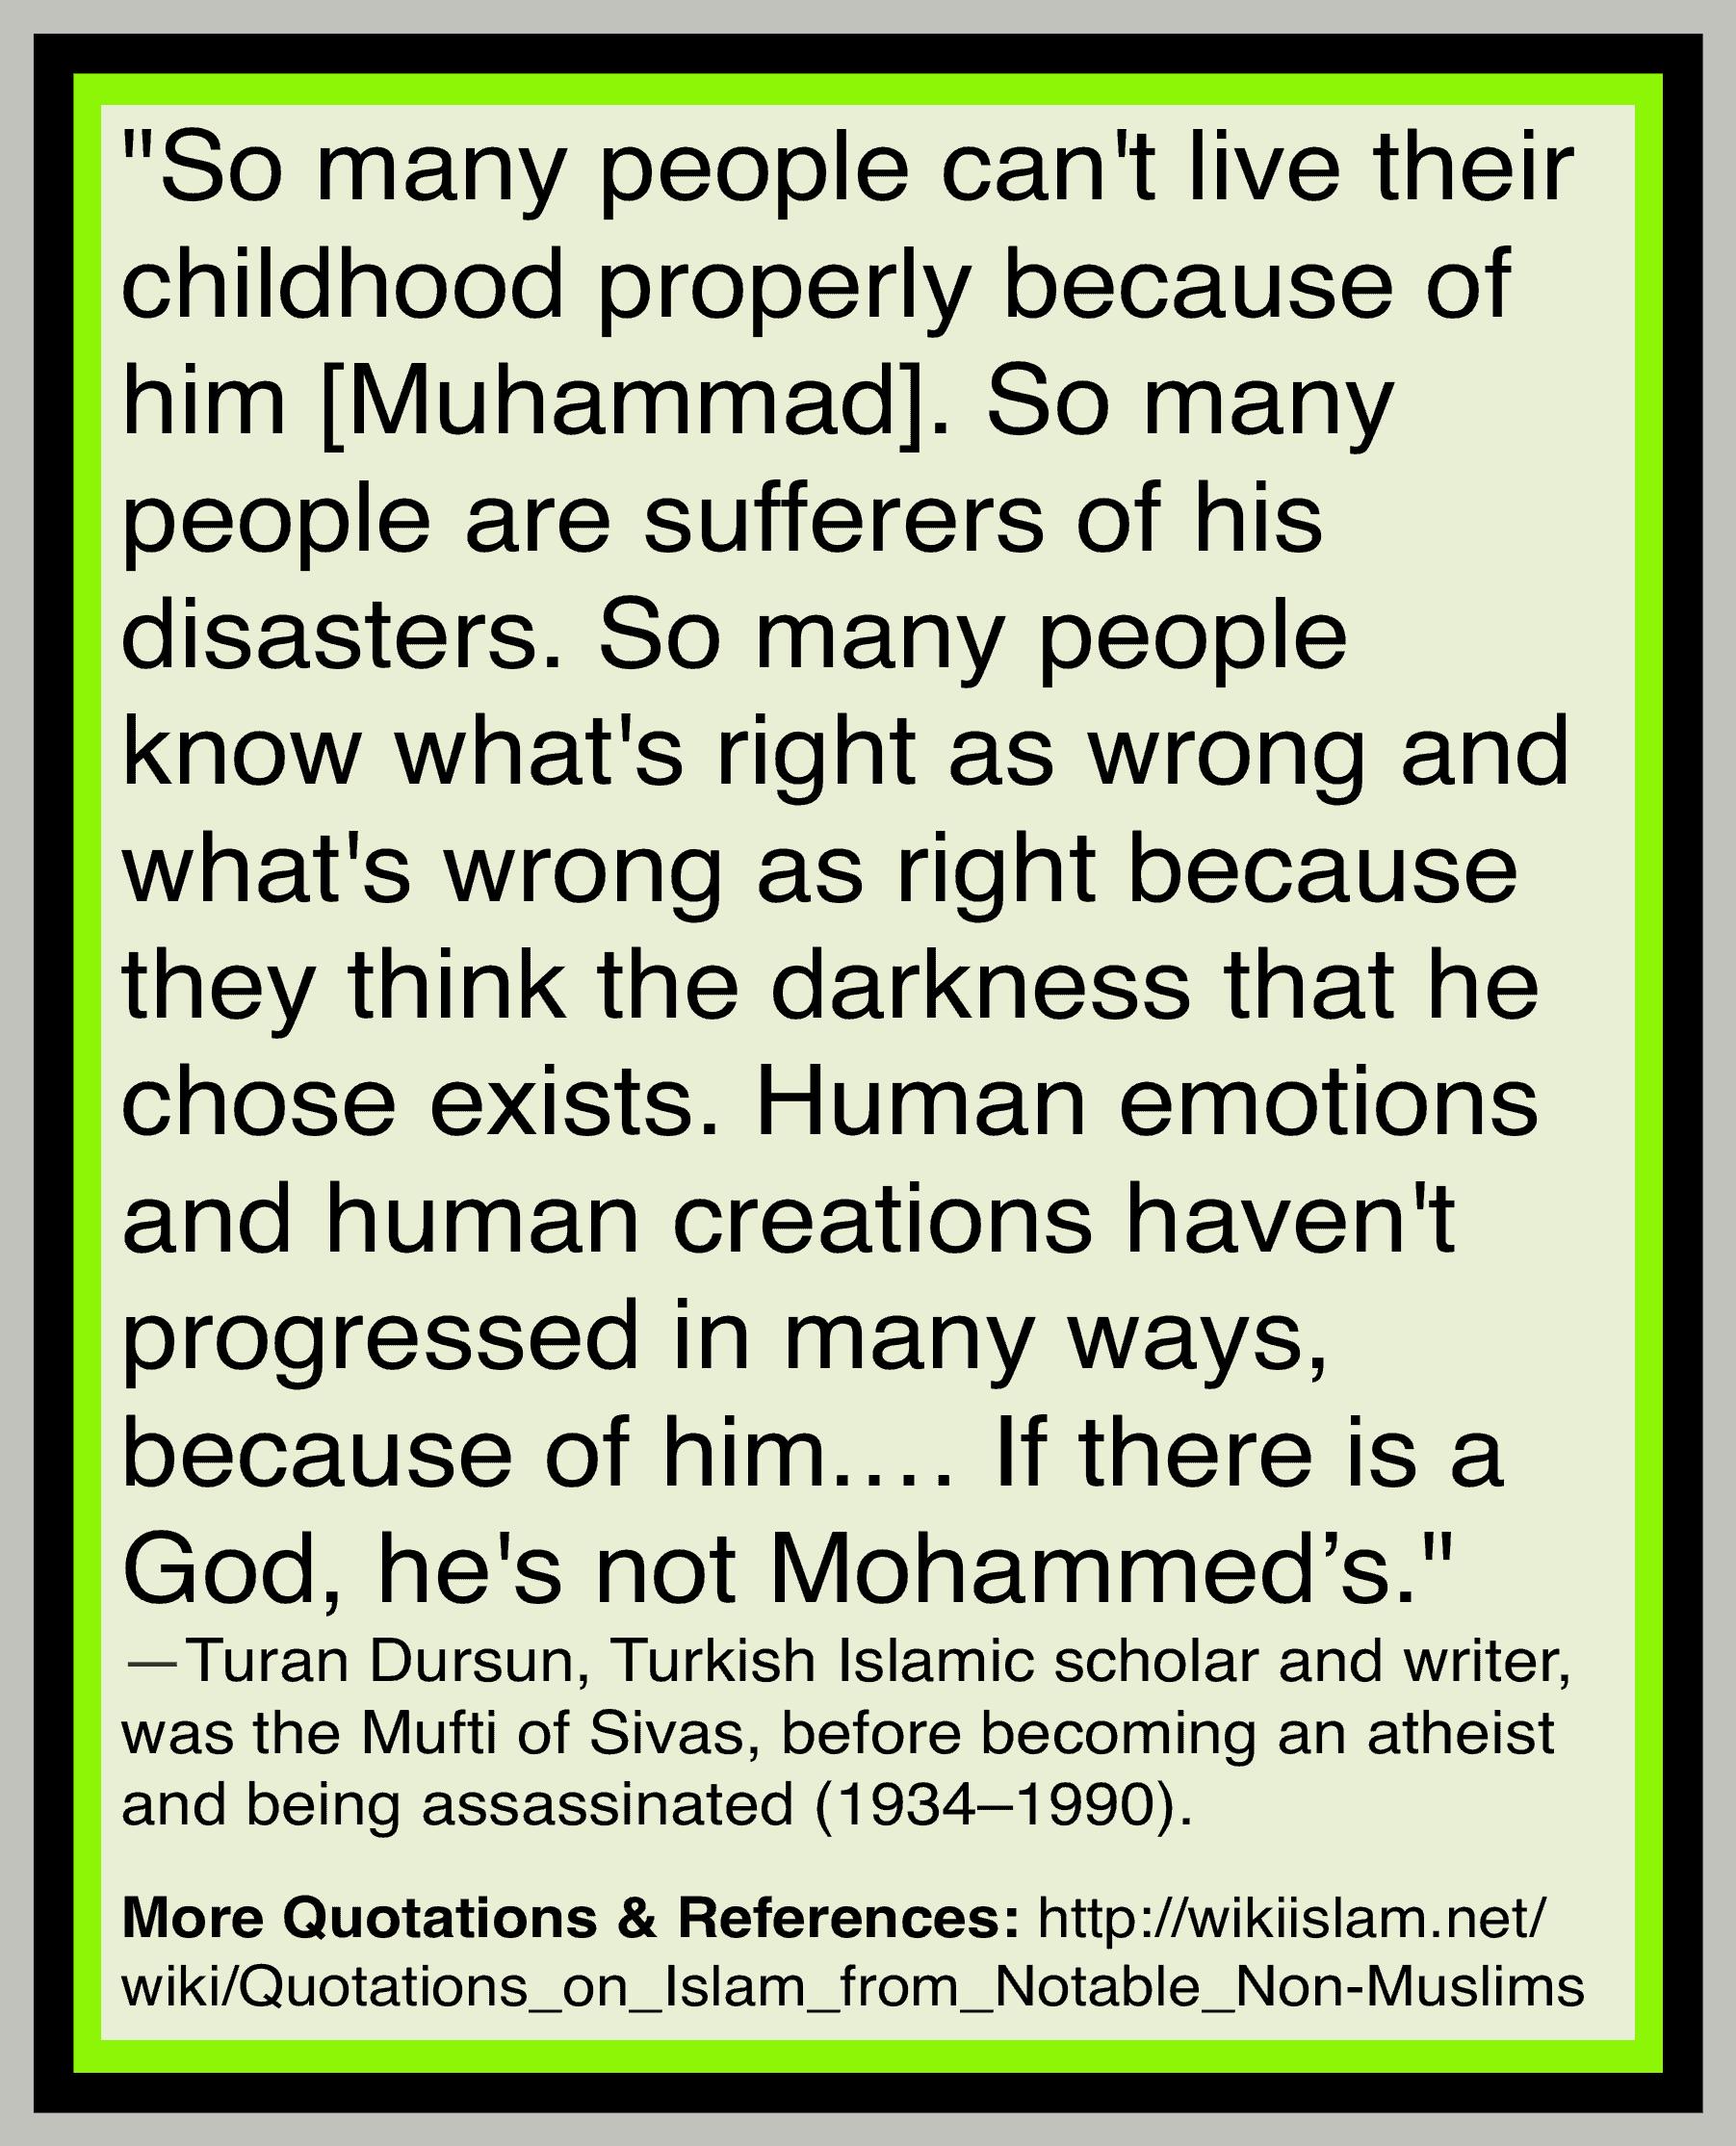 Islam ruins childhood